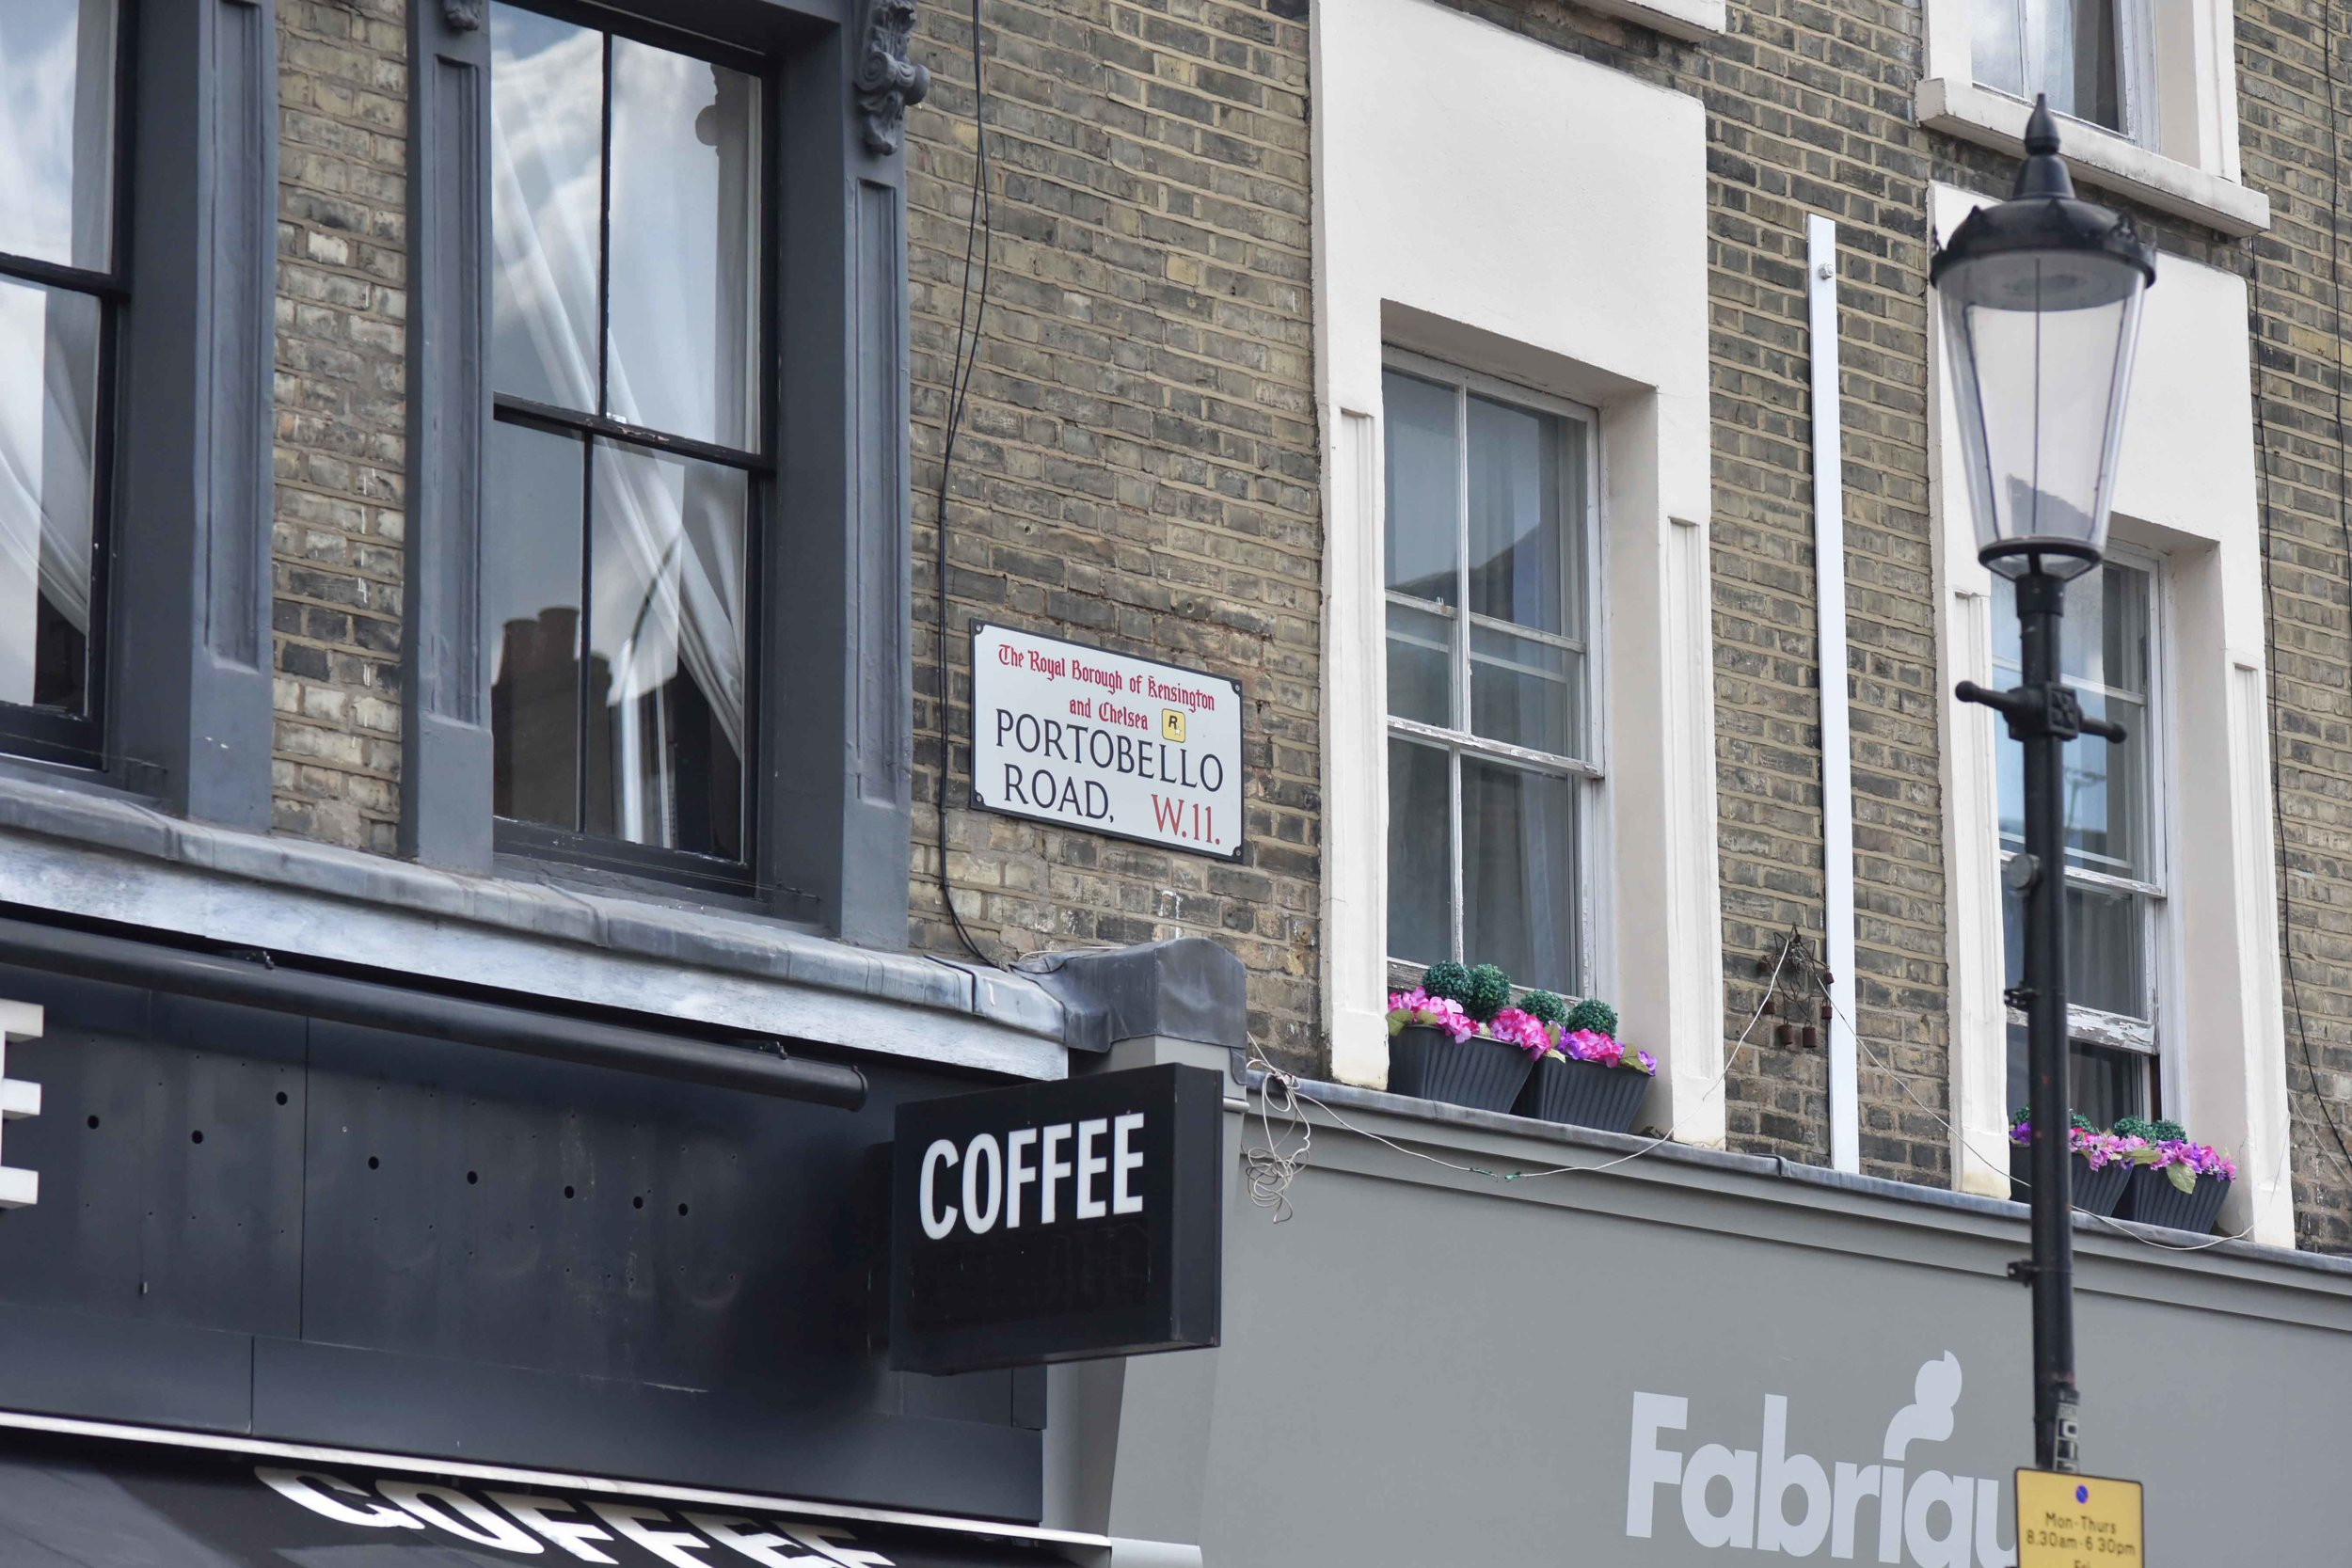 Portobello road, Notting Hill, London, U.K. Image©sourcingstyle.com